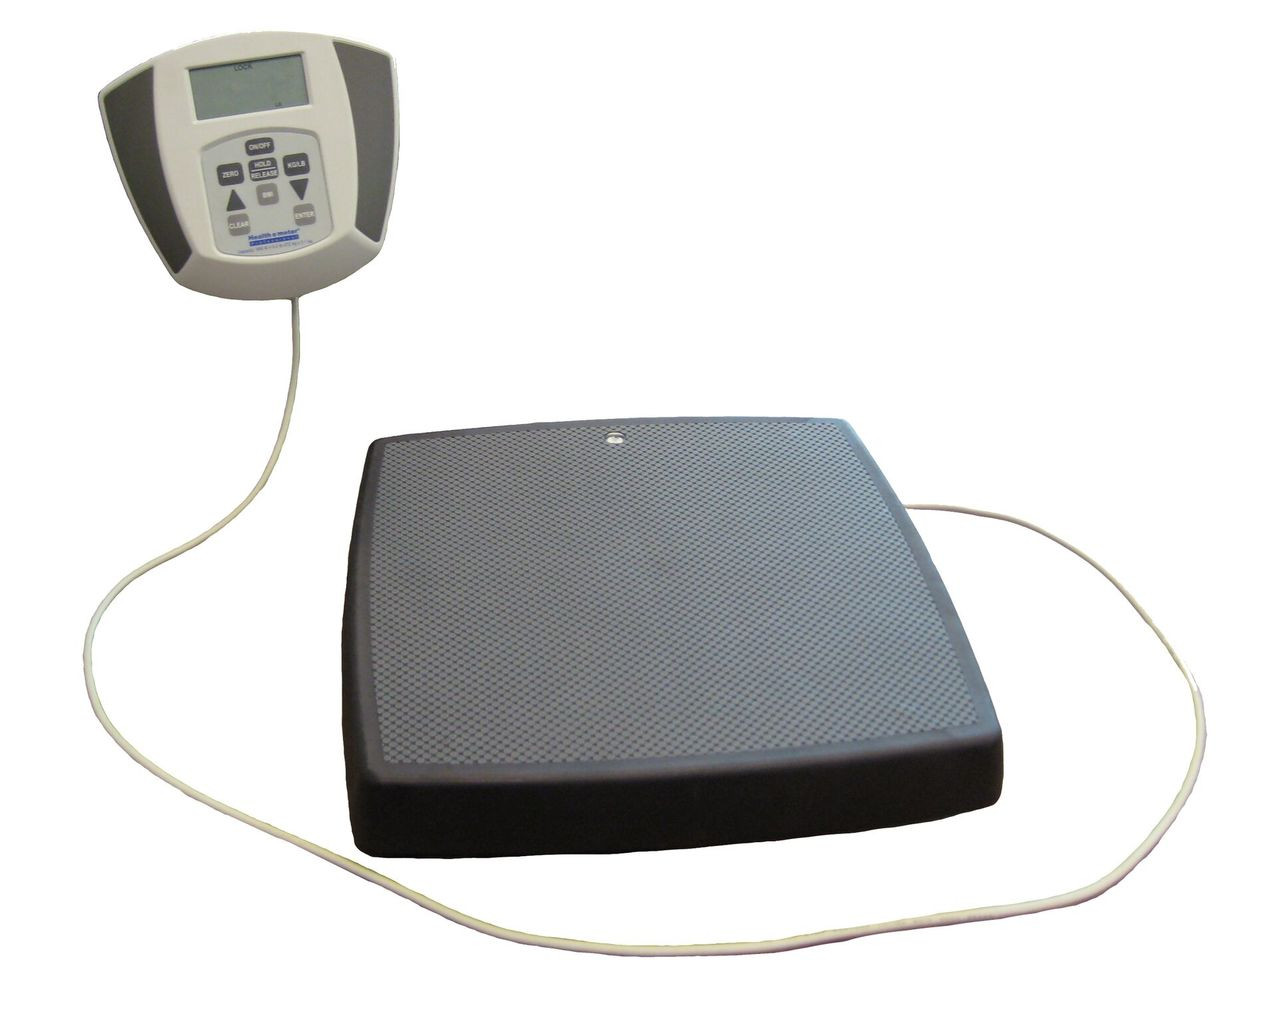 Health o meter 752KL Heavy Duty Remote Display Digital Scale